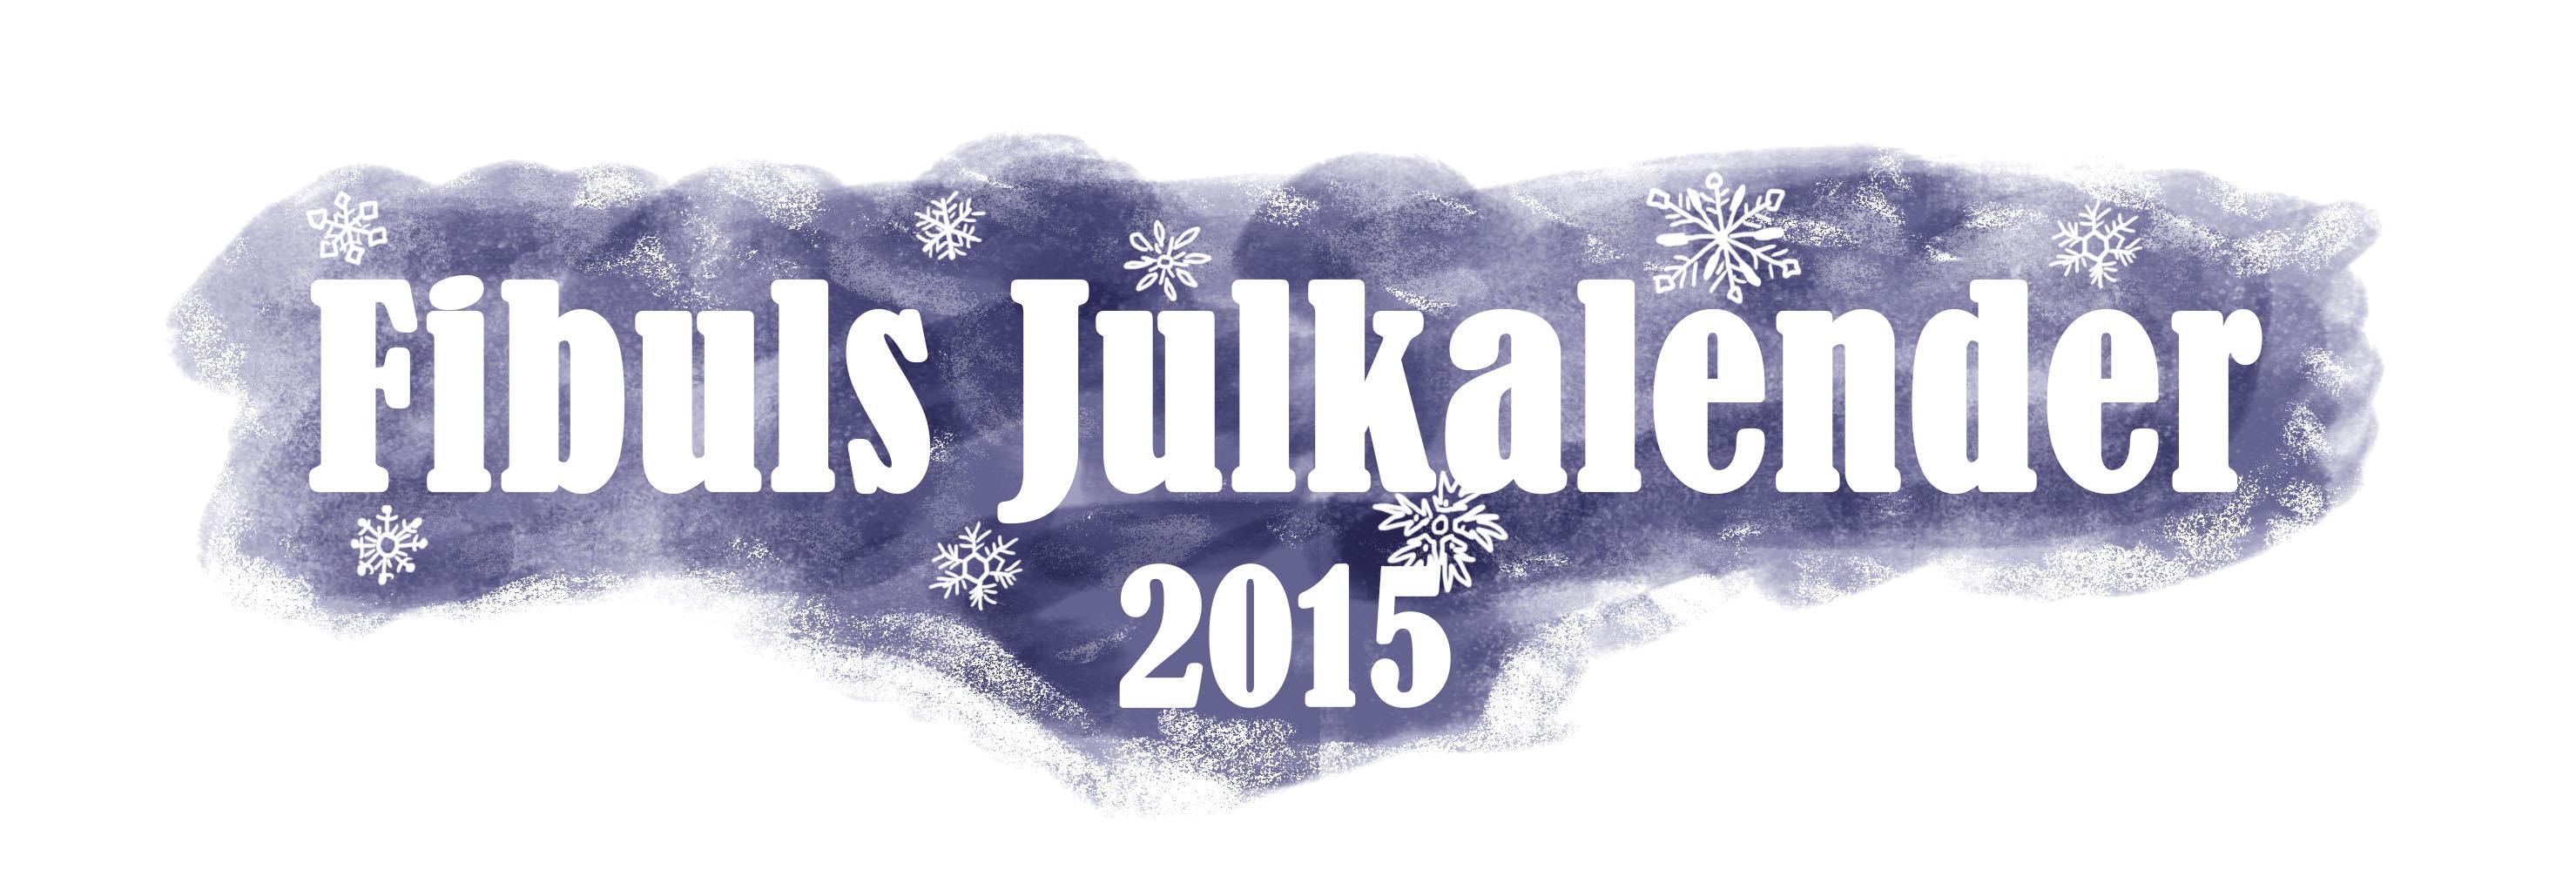 fibulsjulkalender2015_logga